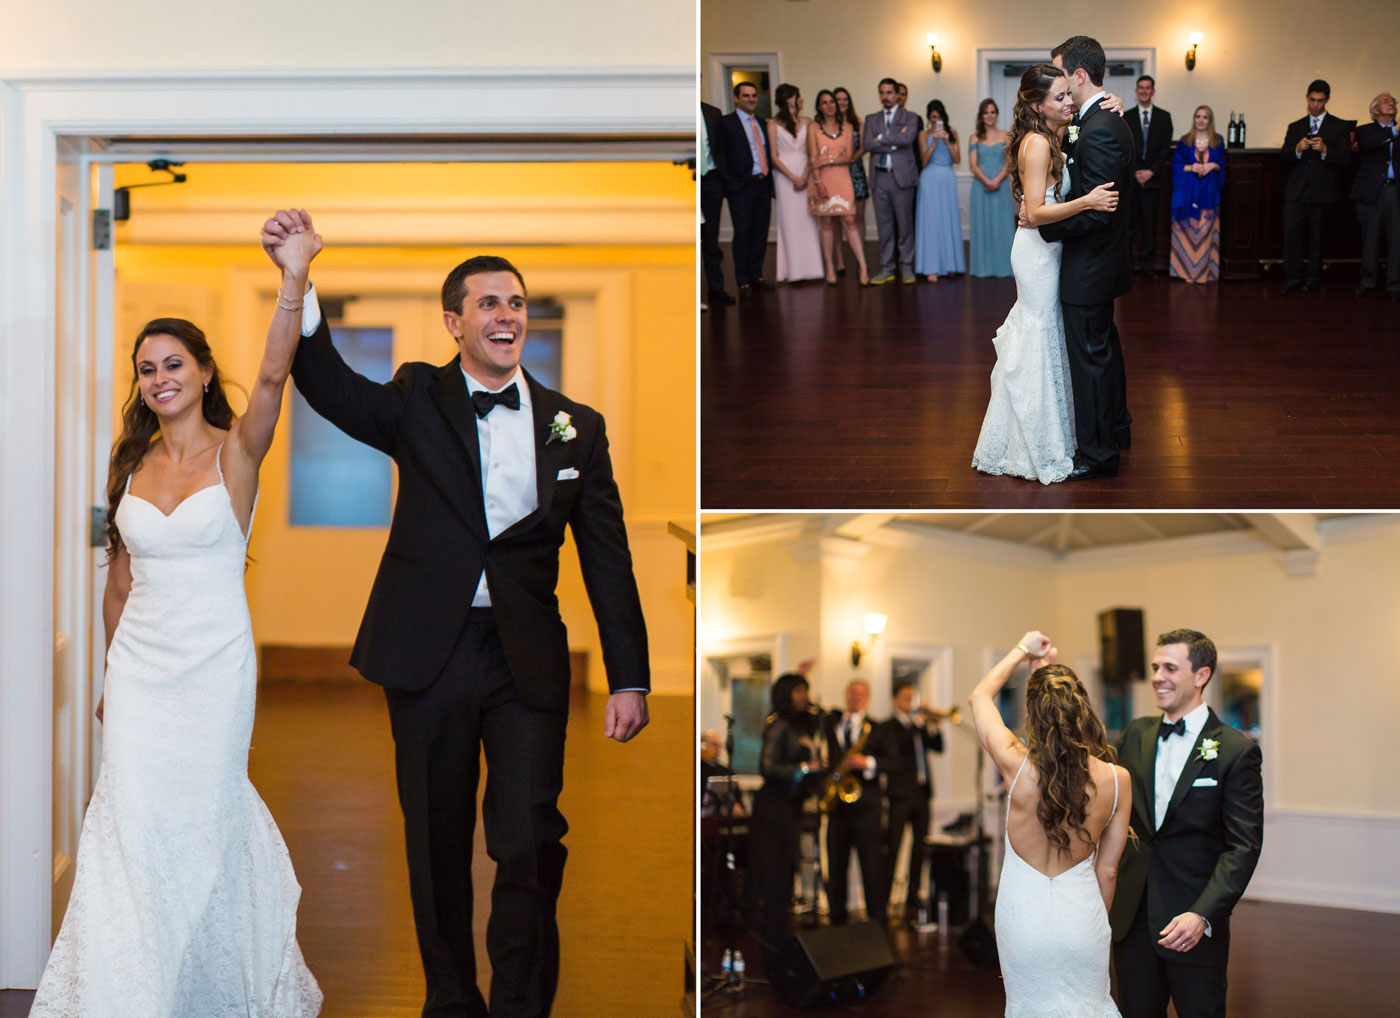 New-York-Wedding-Photographer52.jpg